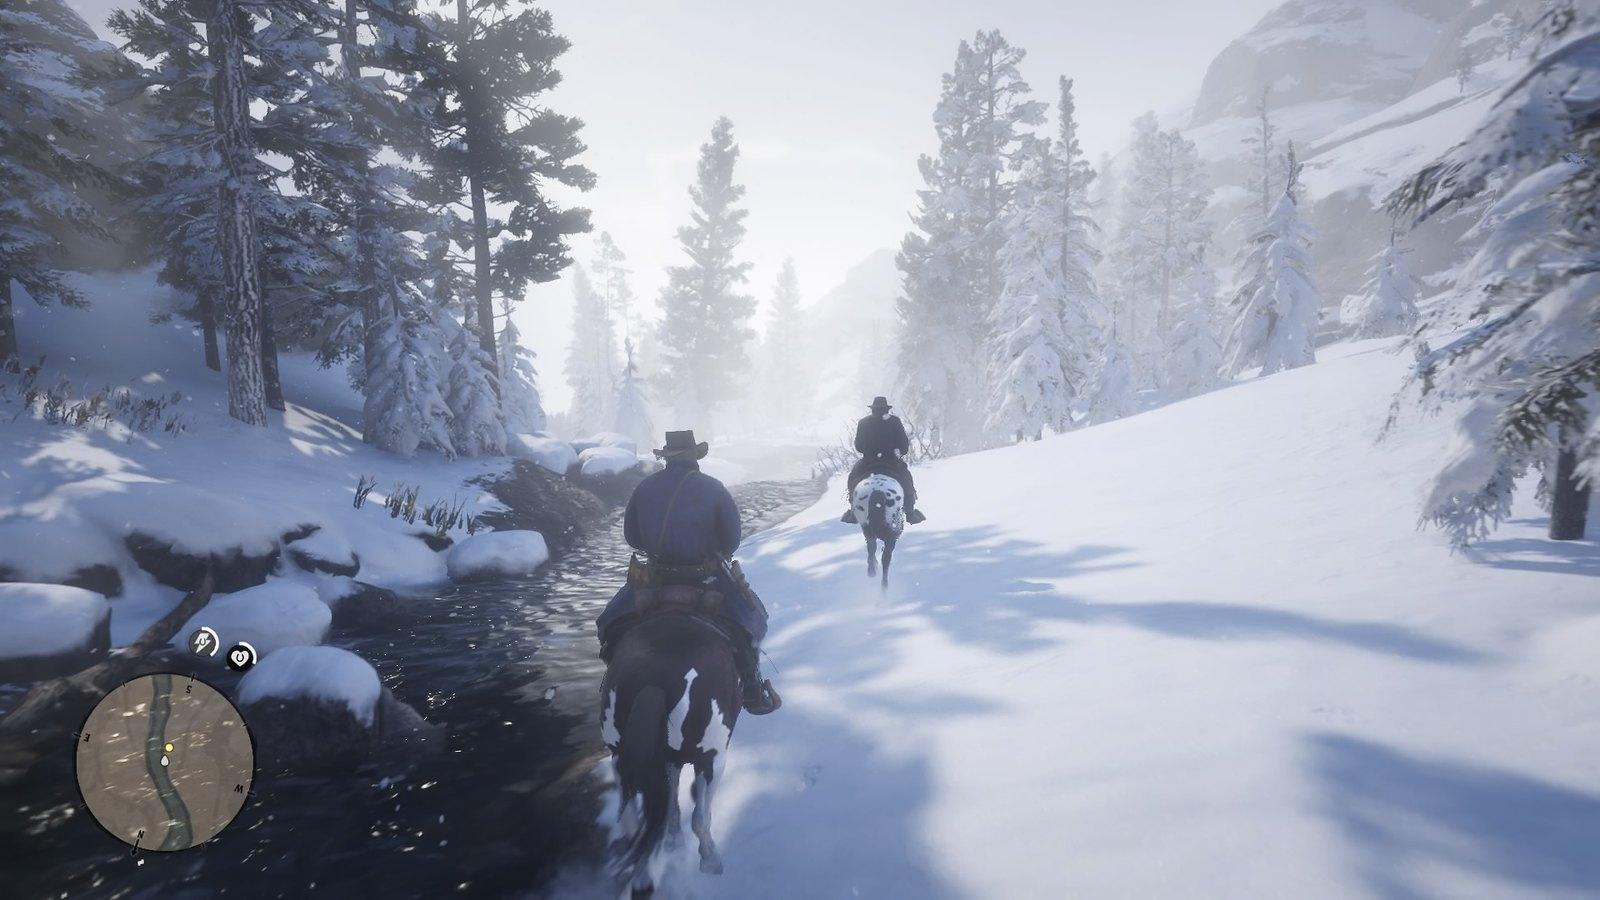 Gar ledaino kalnu upi